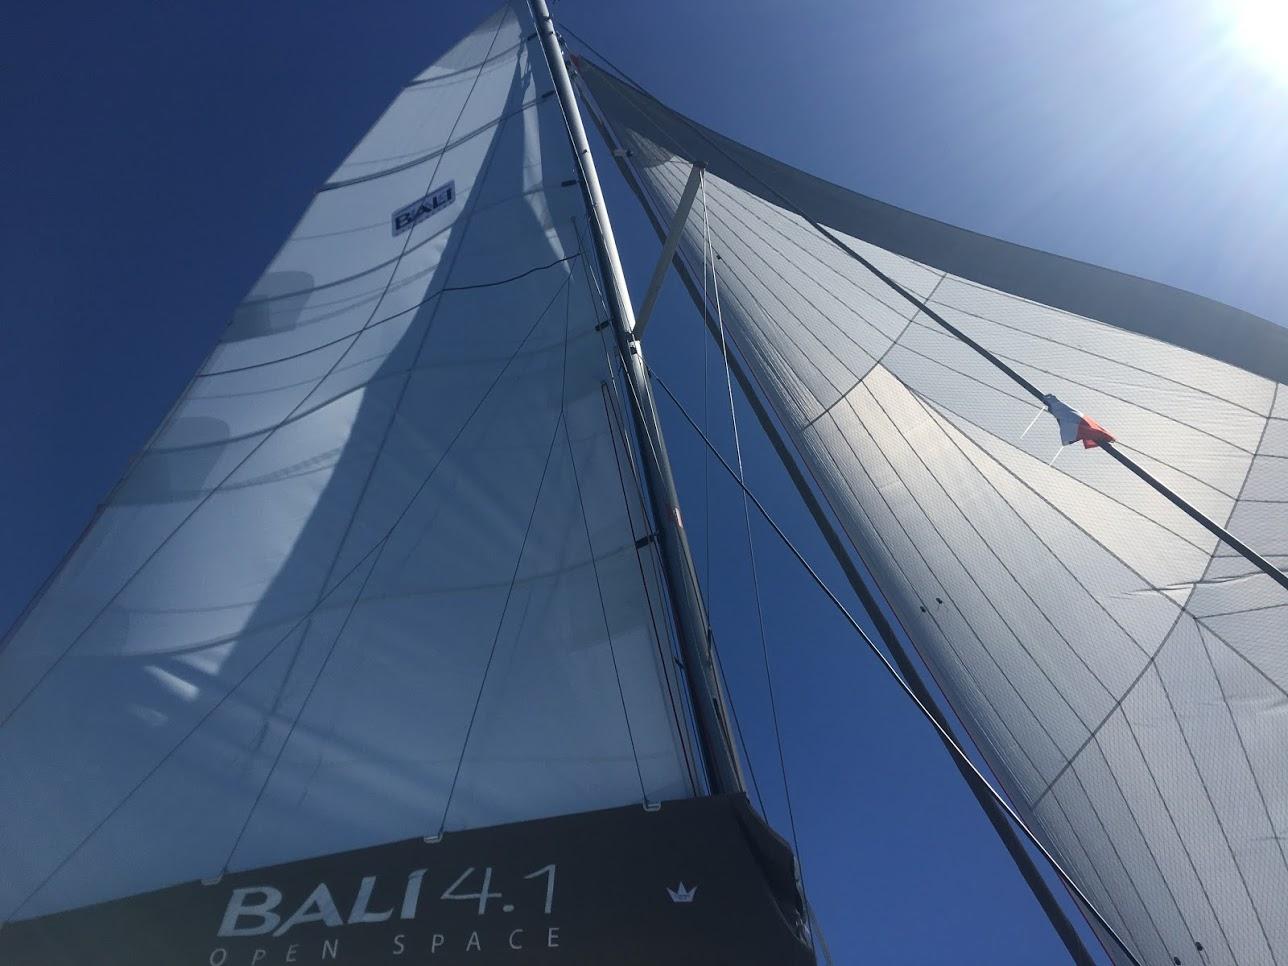 Bali 4.1 (Iris)  - 7